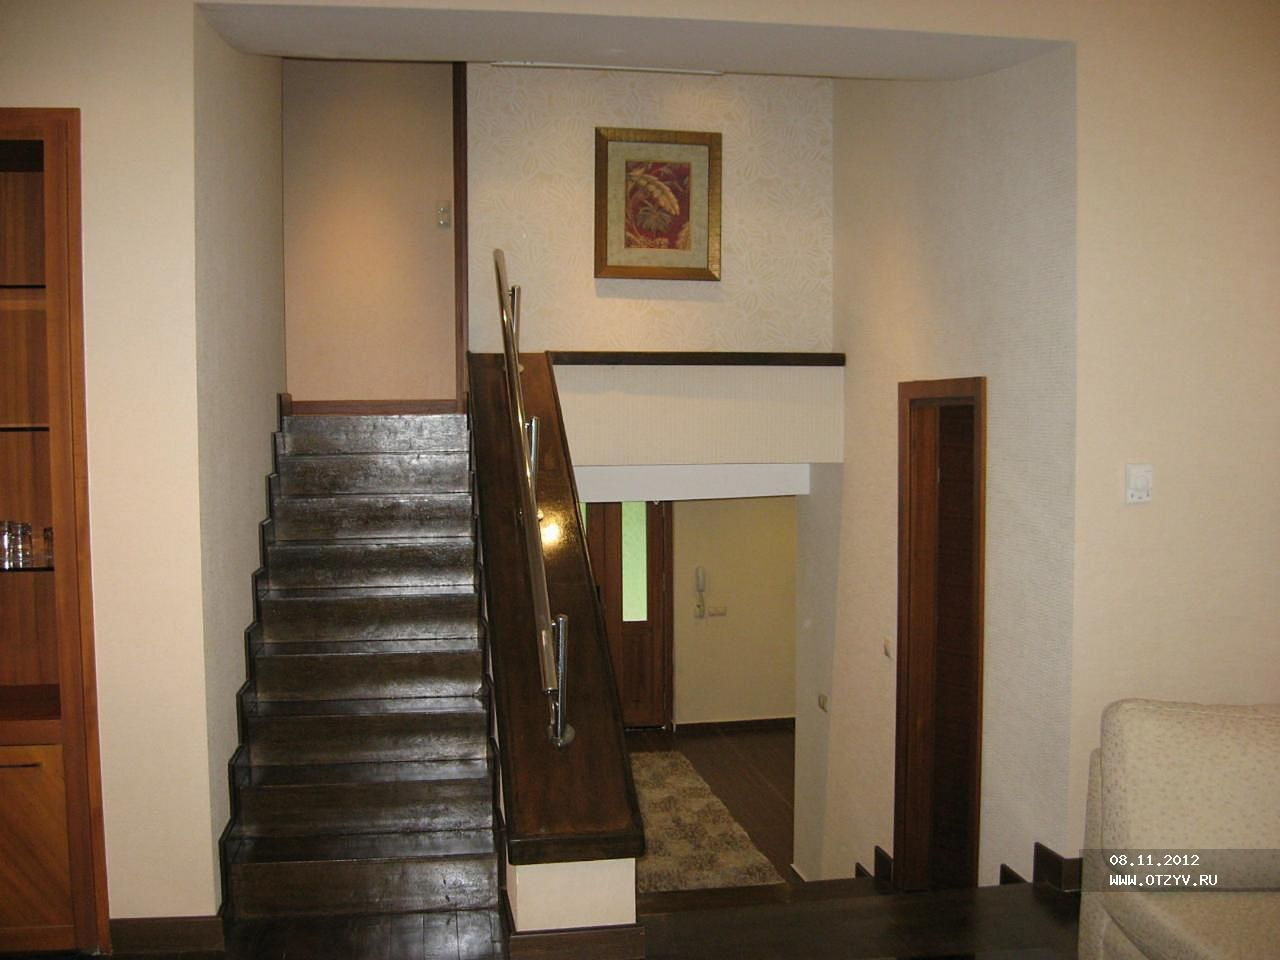 Лестница на второй этаж… кровати!